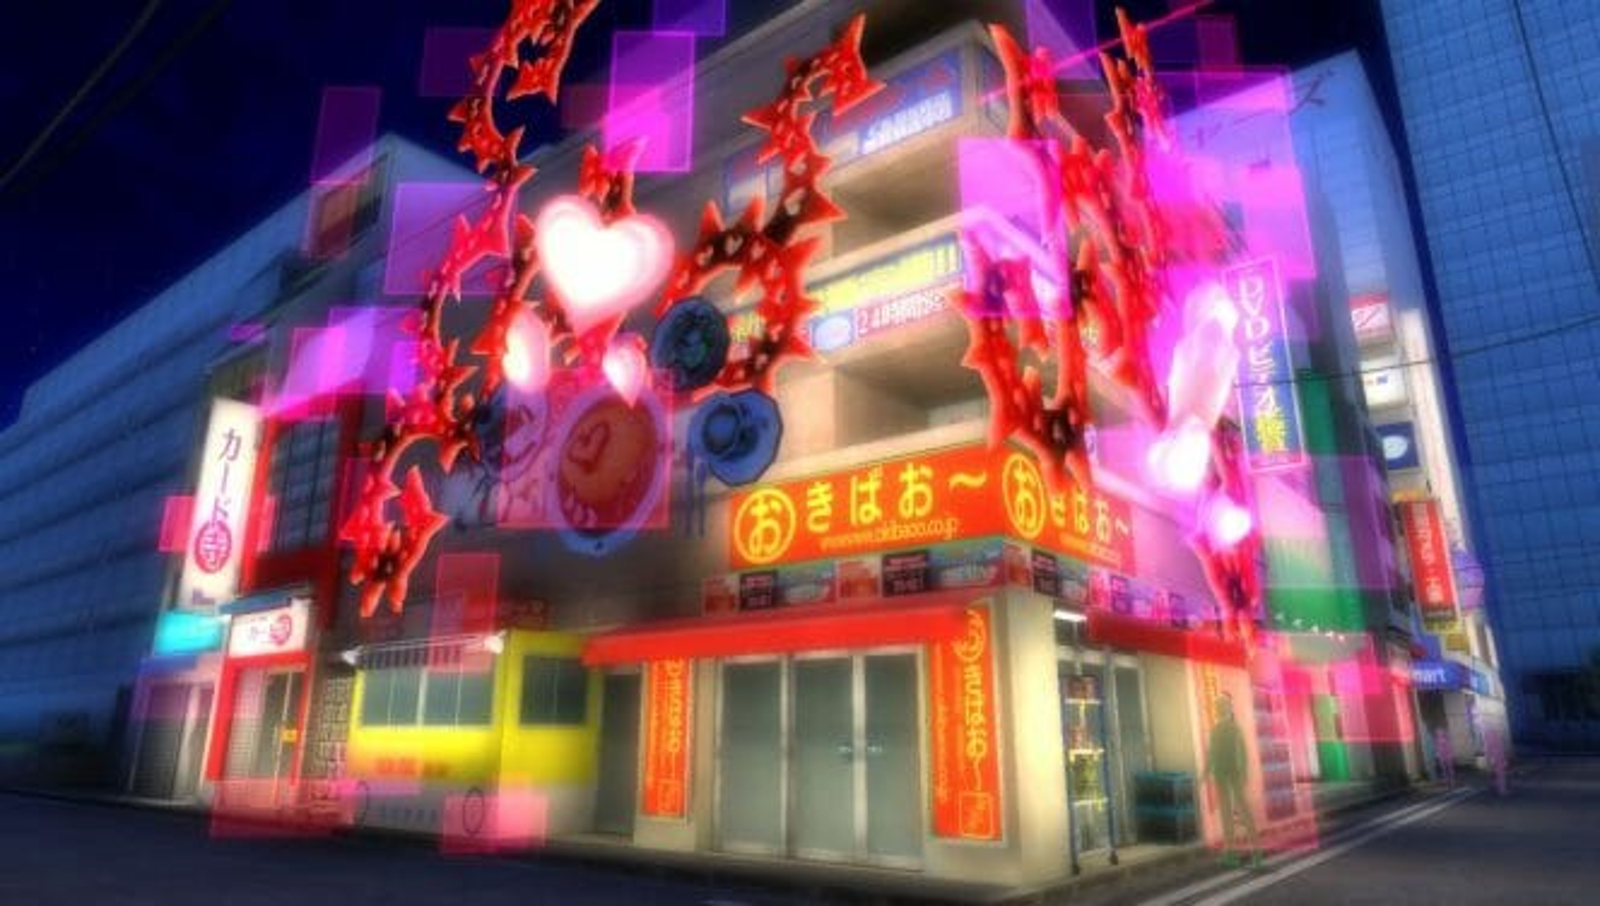 Akiba's Beat Review - A Statement On Otaku Culture 6